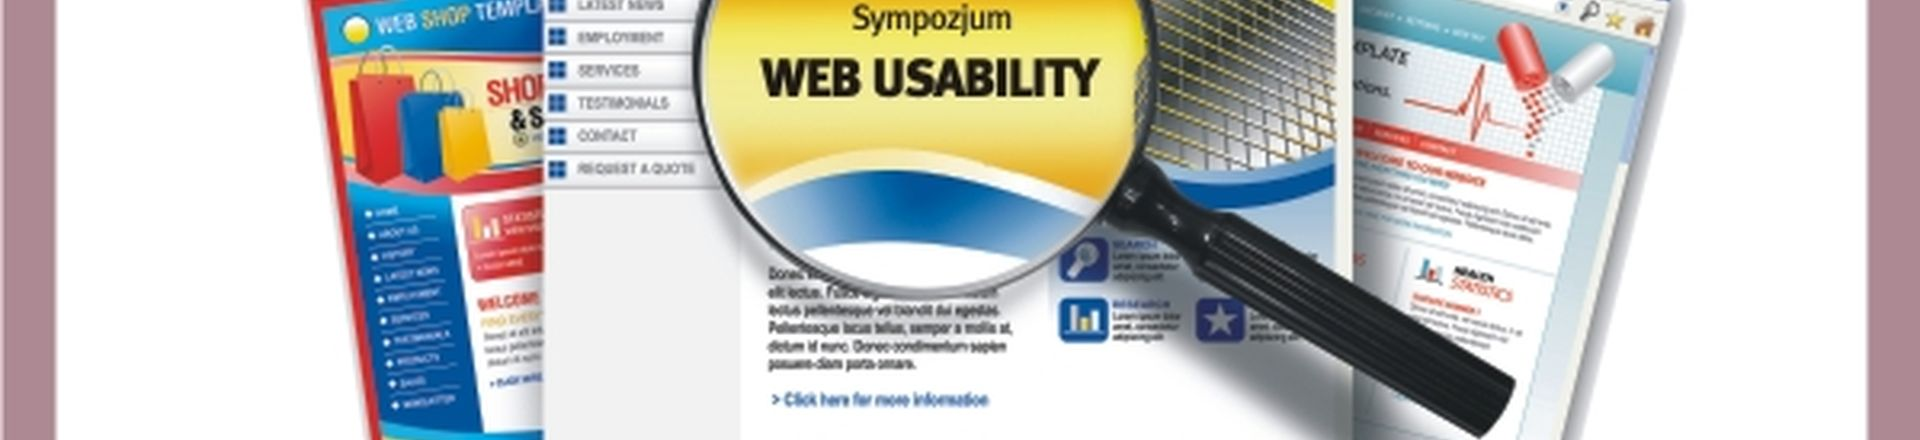 Sympozjum Web Usability